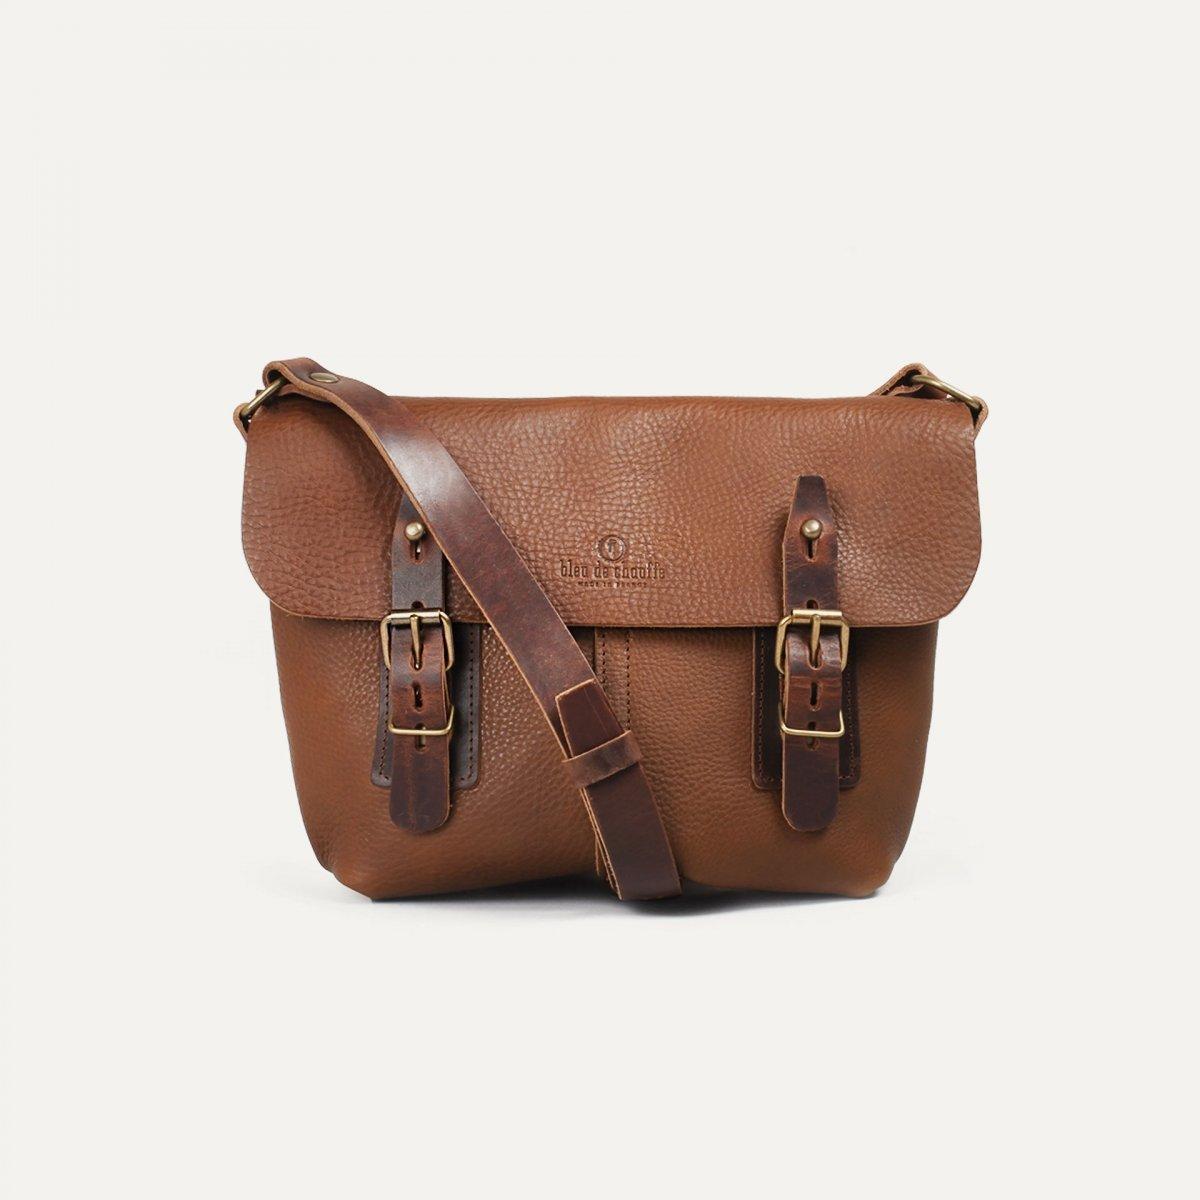 Louis Satchel bag - Cuba Libre (image n°1)